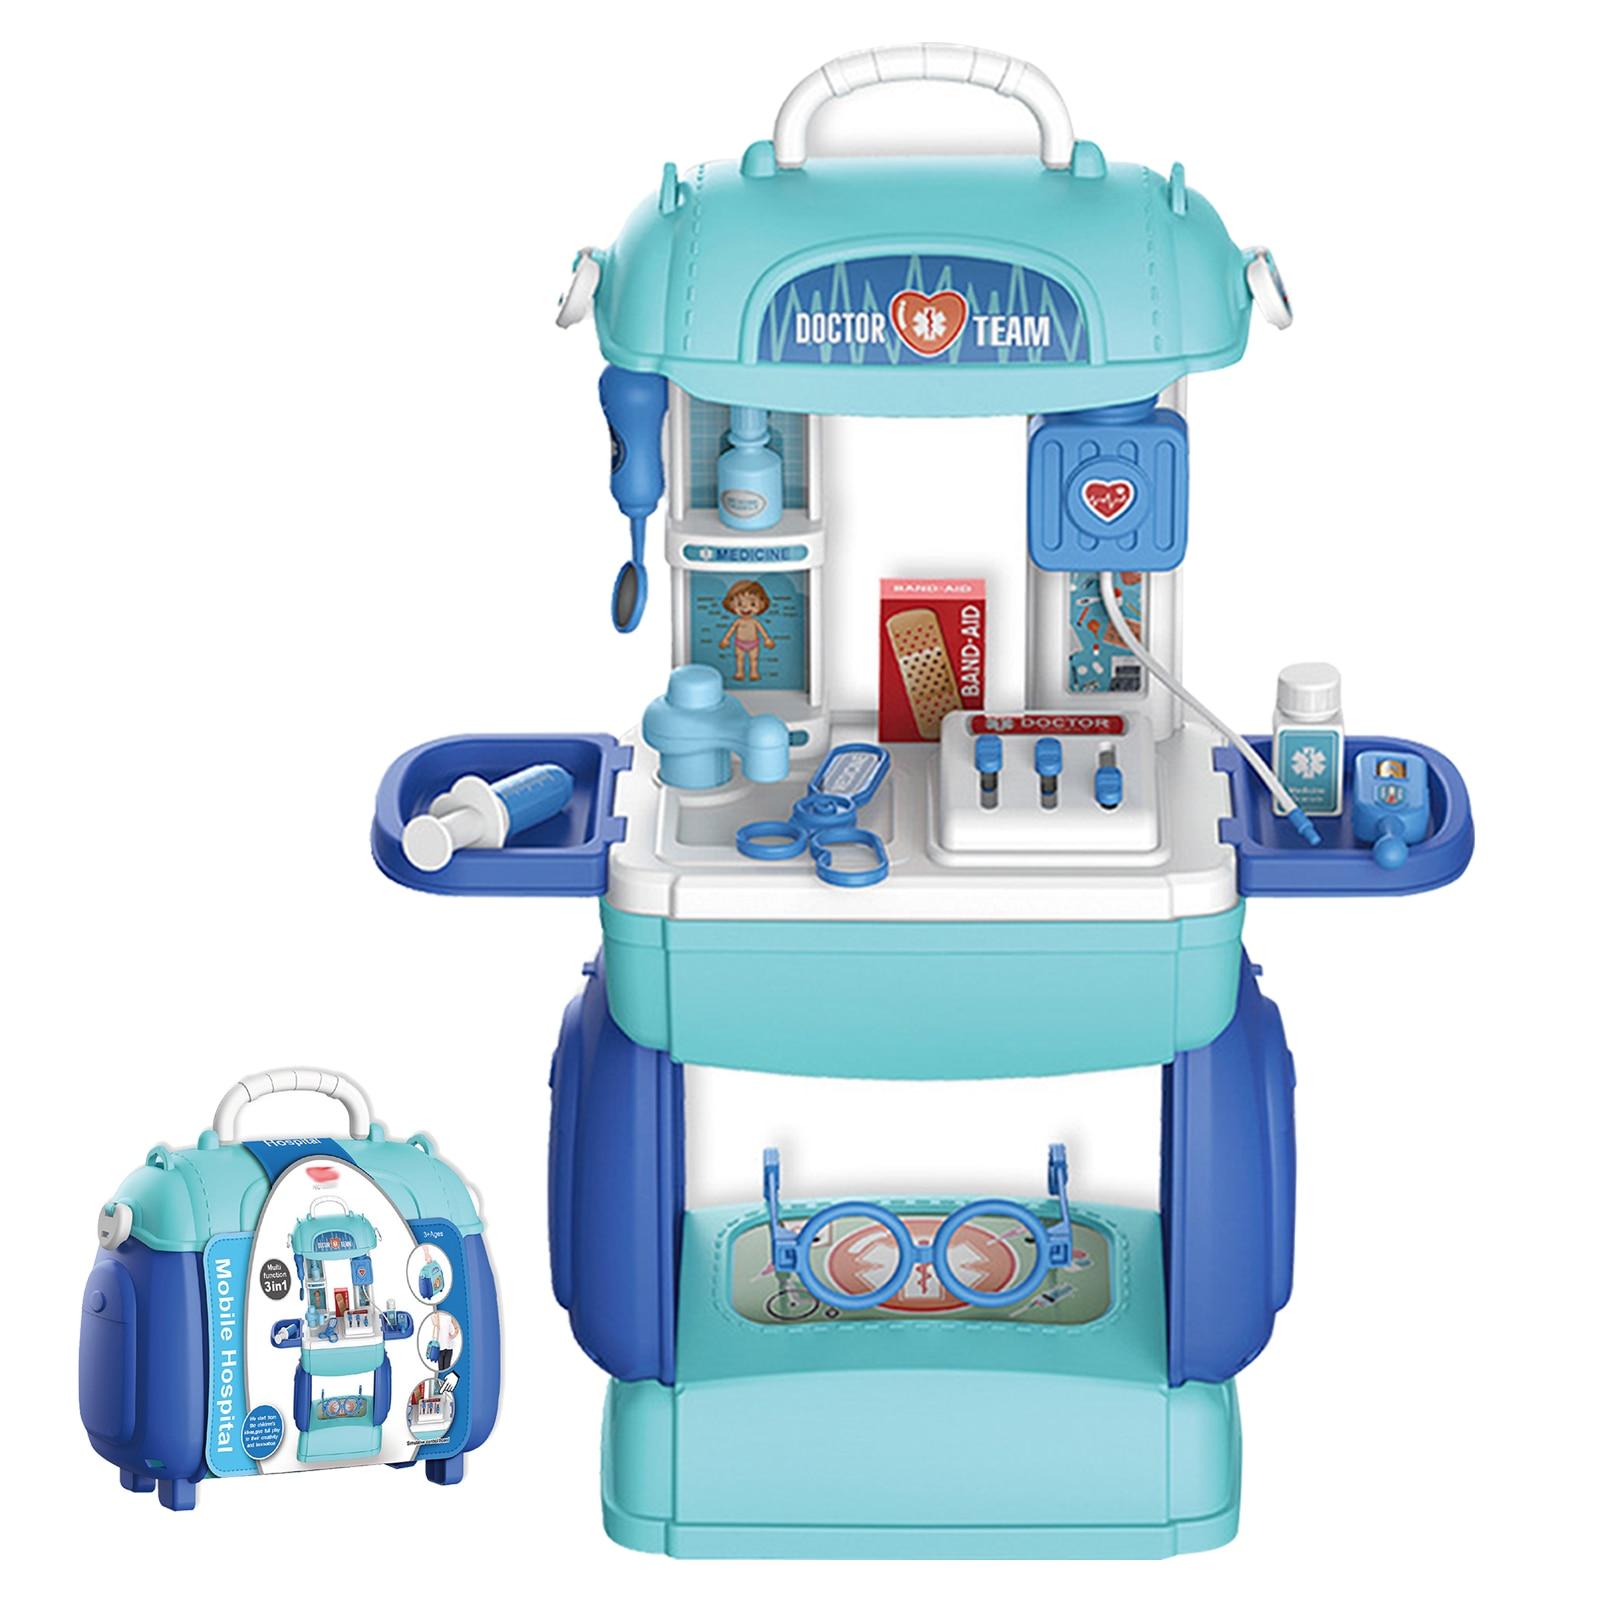 brinquedo medico para meninos e meninas brinquedo de simulacao para criancas